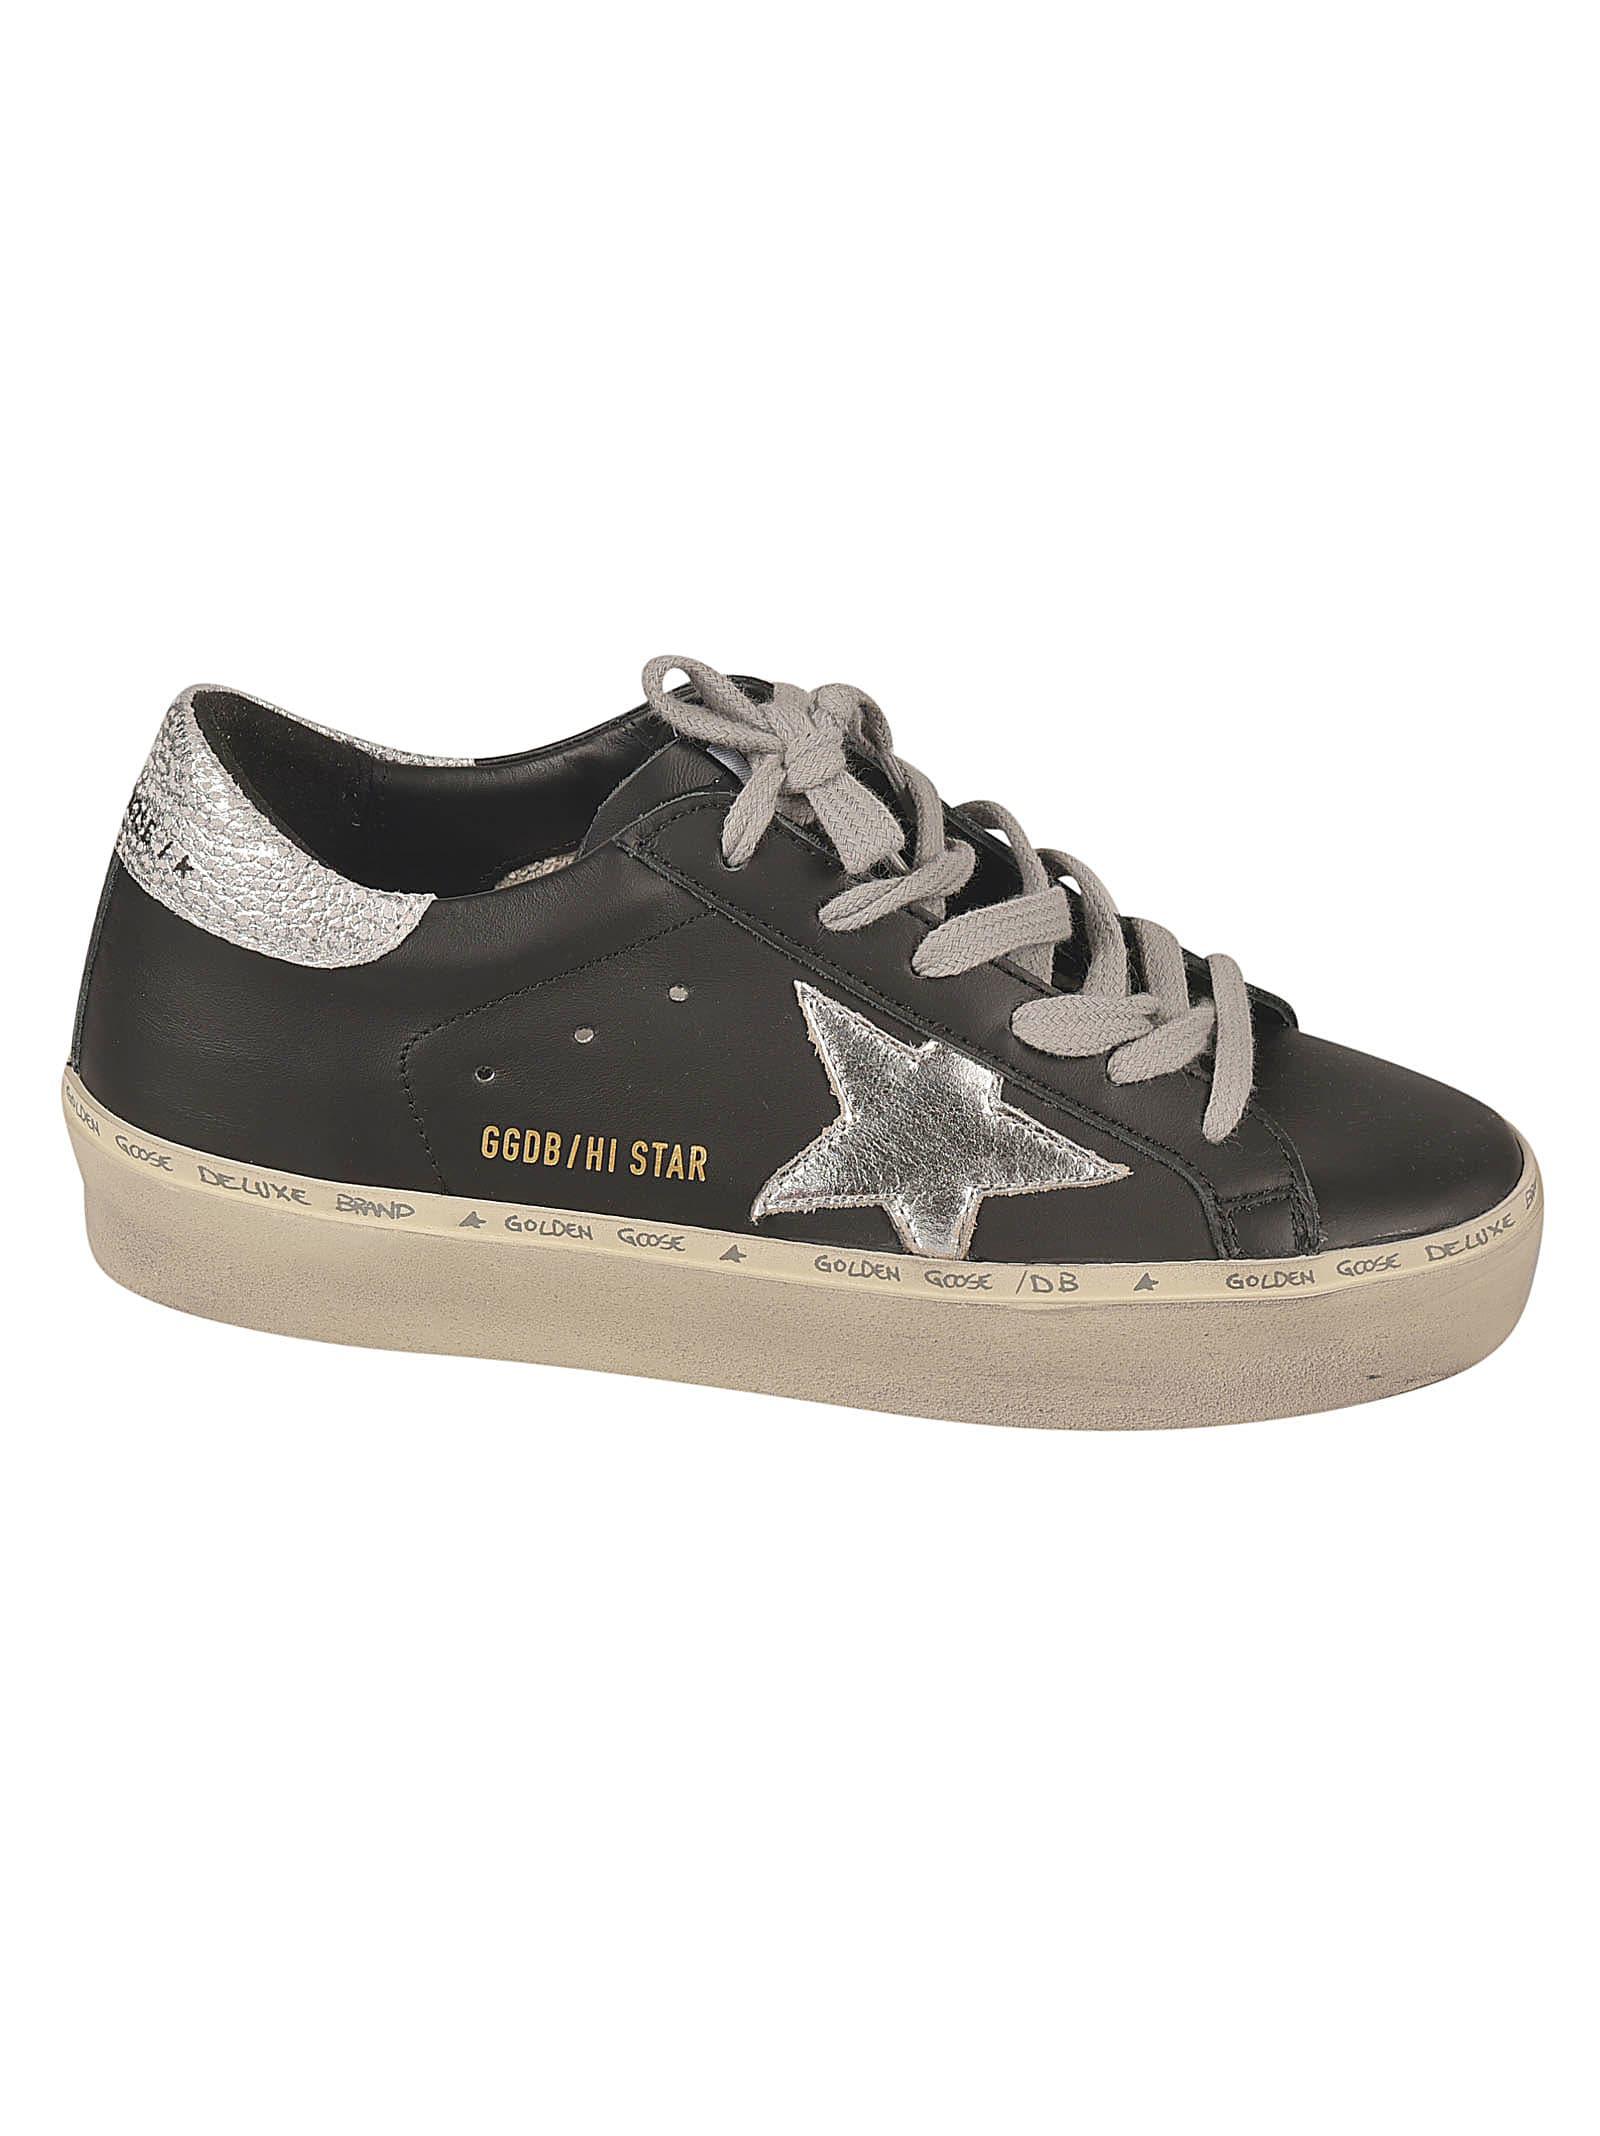 Golden Goose Classic Hi Star Sneakers